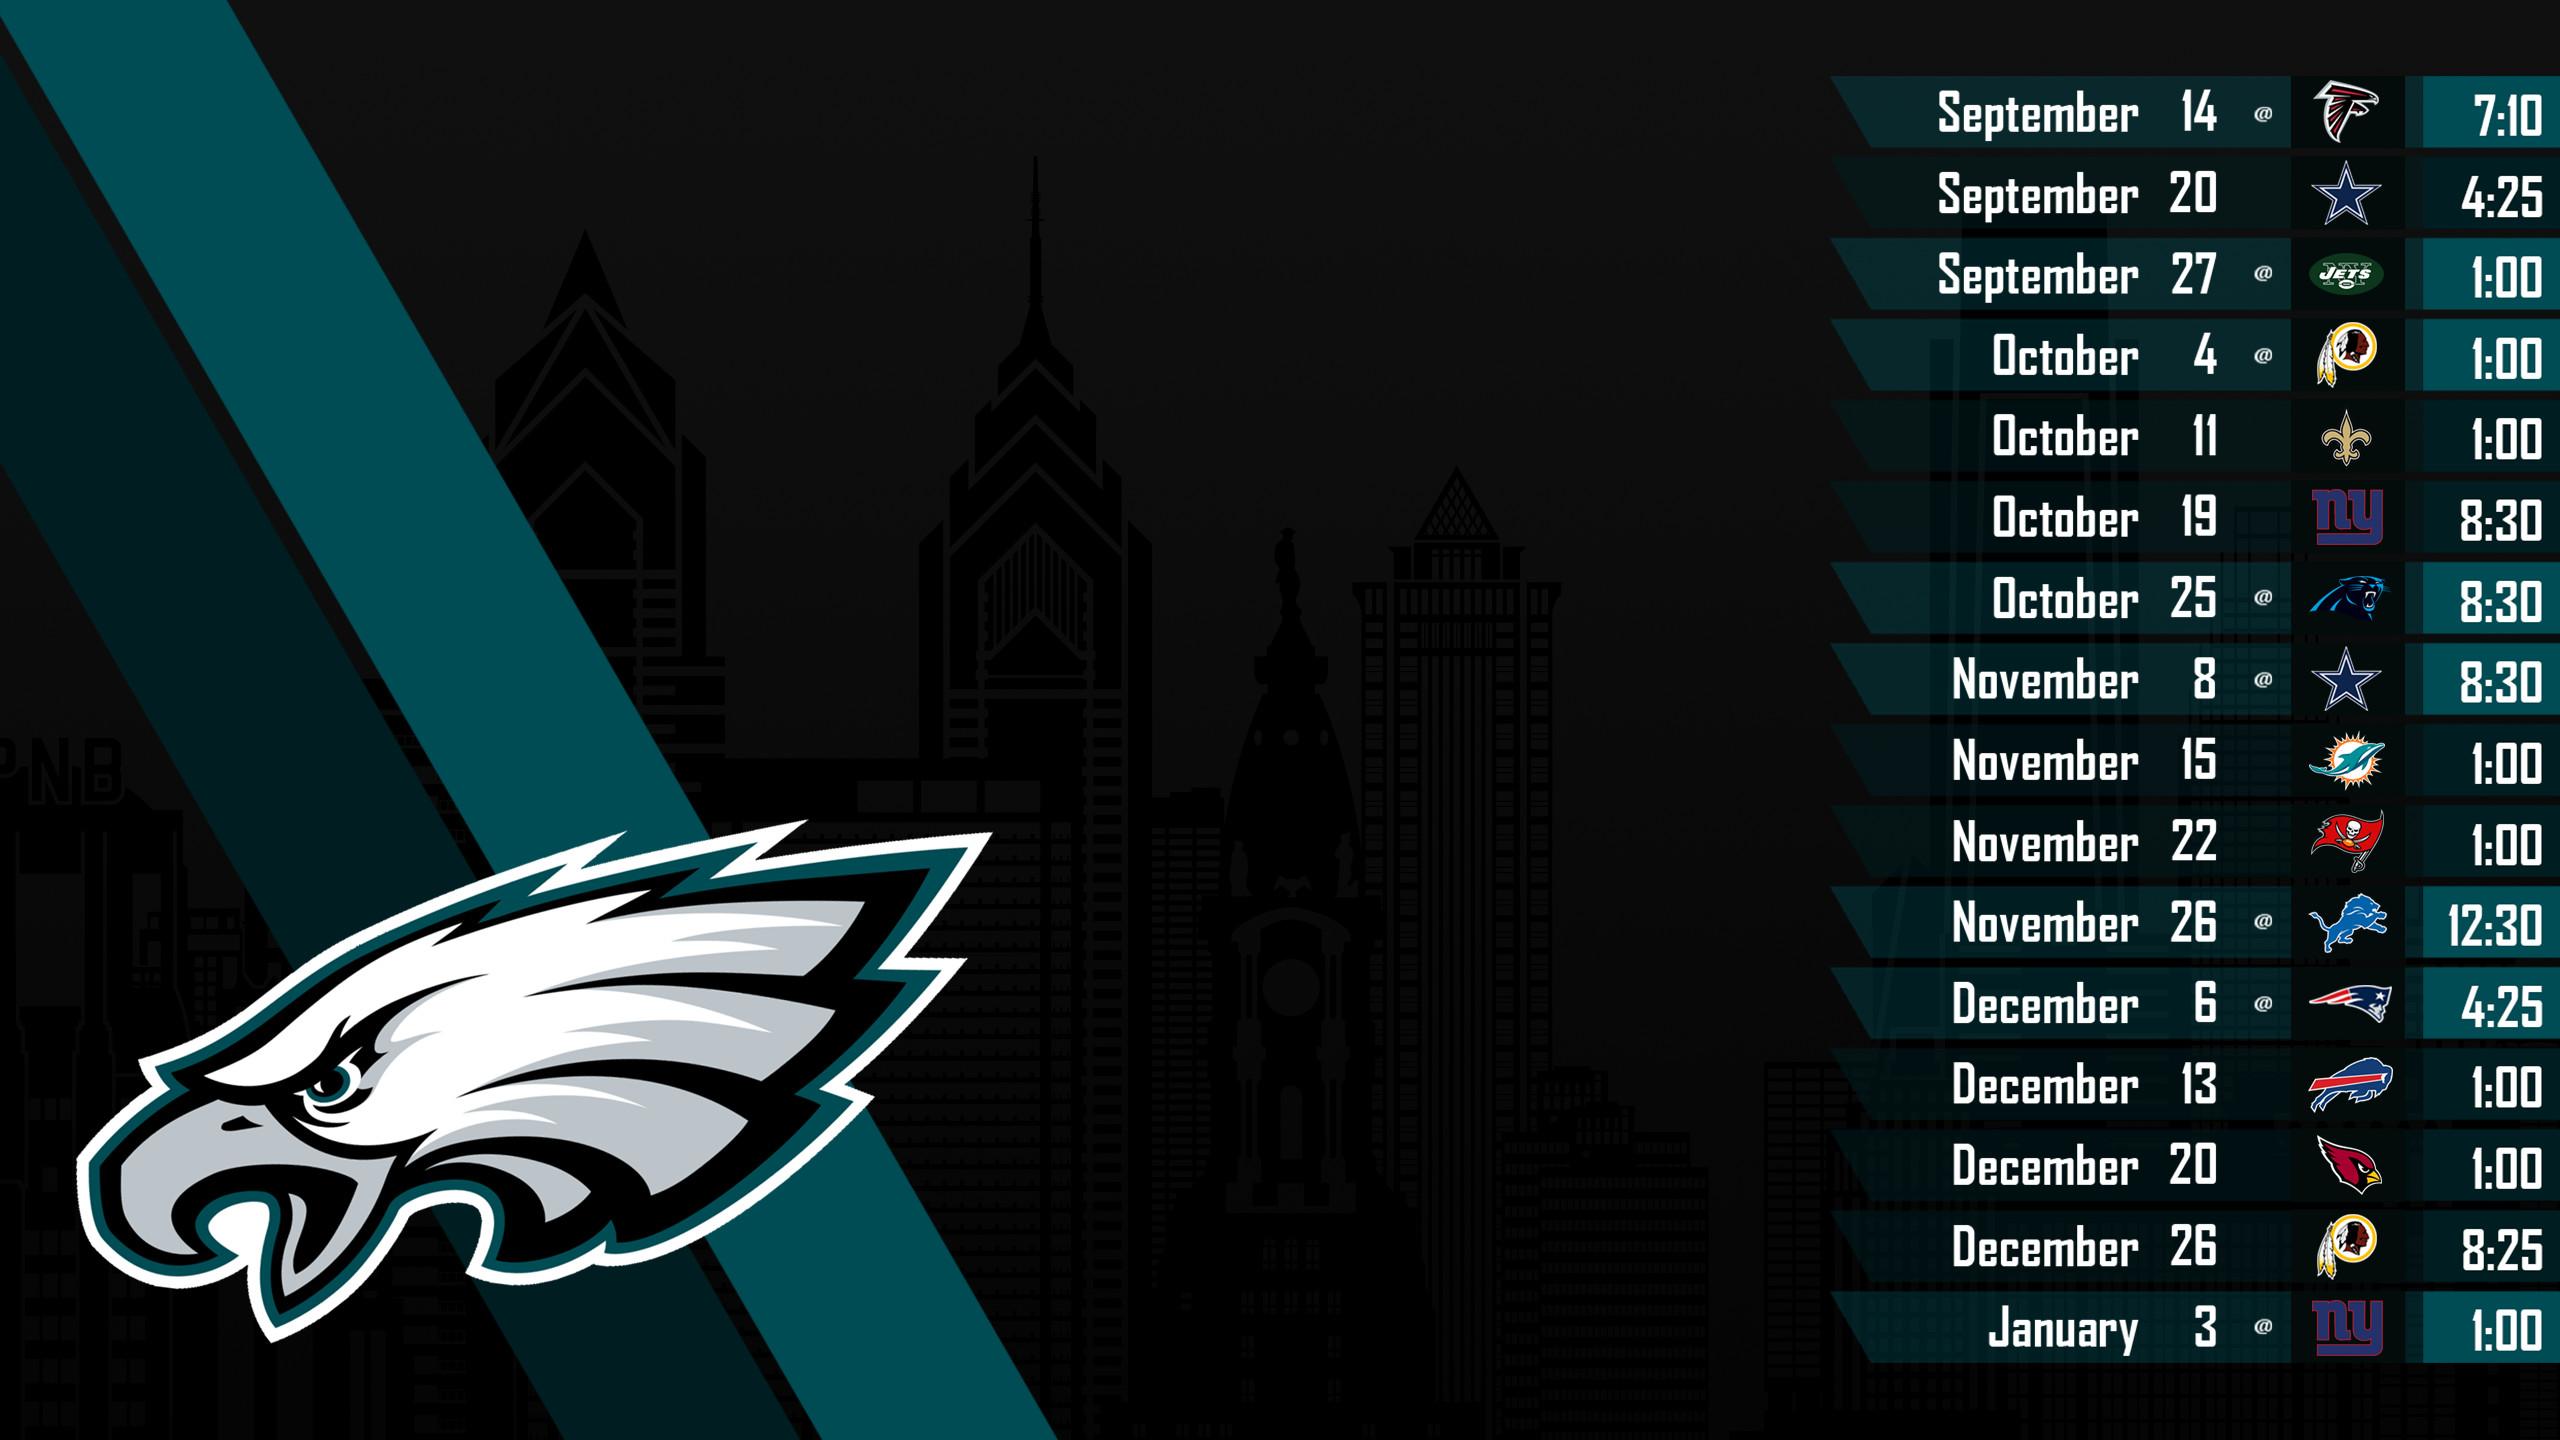 Philadelphia Eagles 2018 Schedule Wallpaper 56 Images